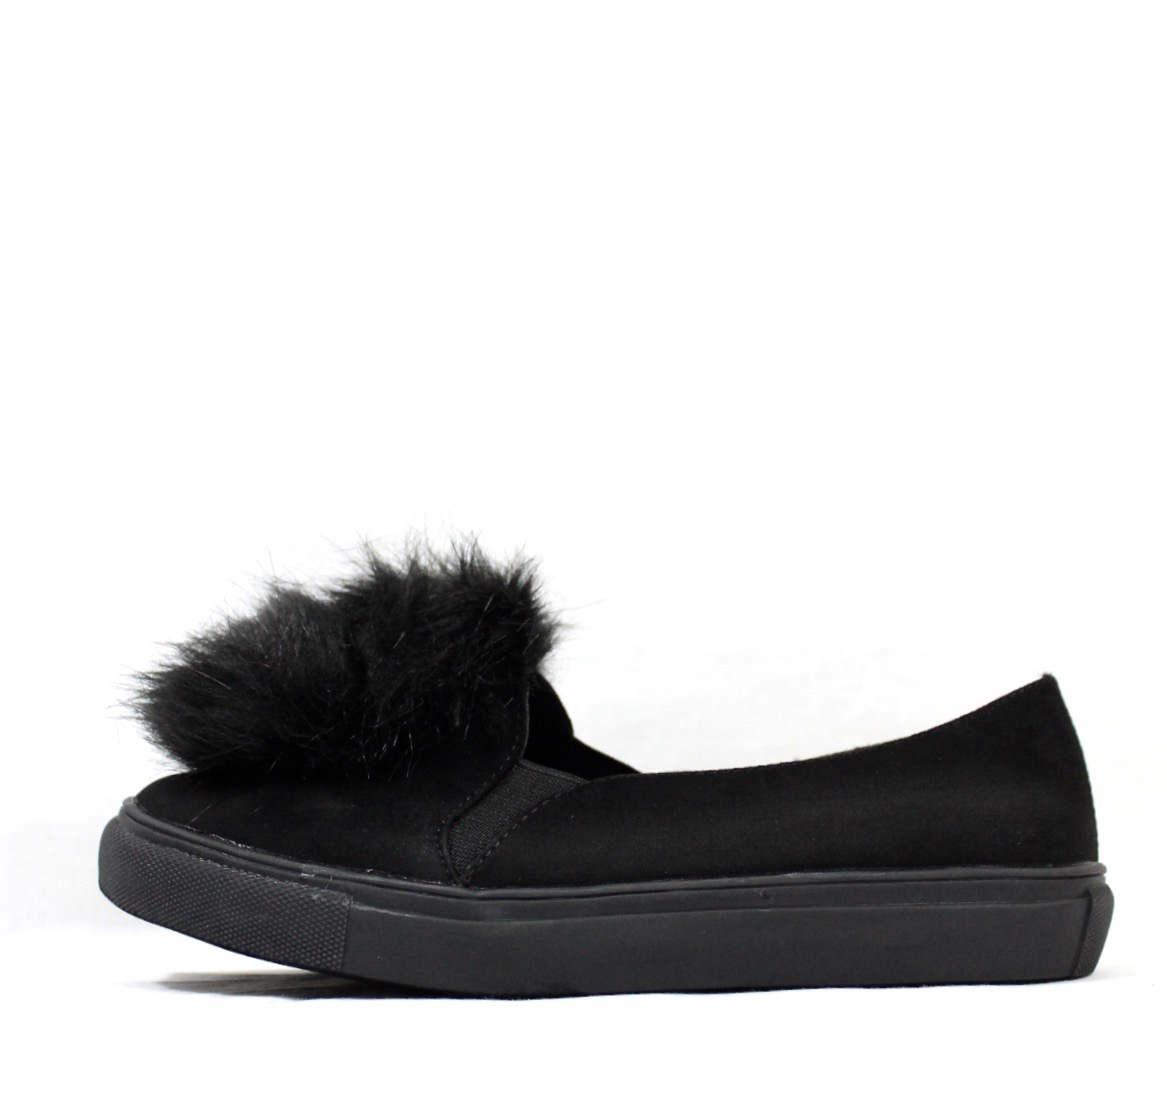 Liliana Bailey-1 Black Flat Slip On Faux Fur Ball Pom Pom Round Toe Sneakers-4355